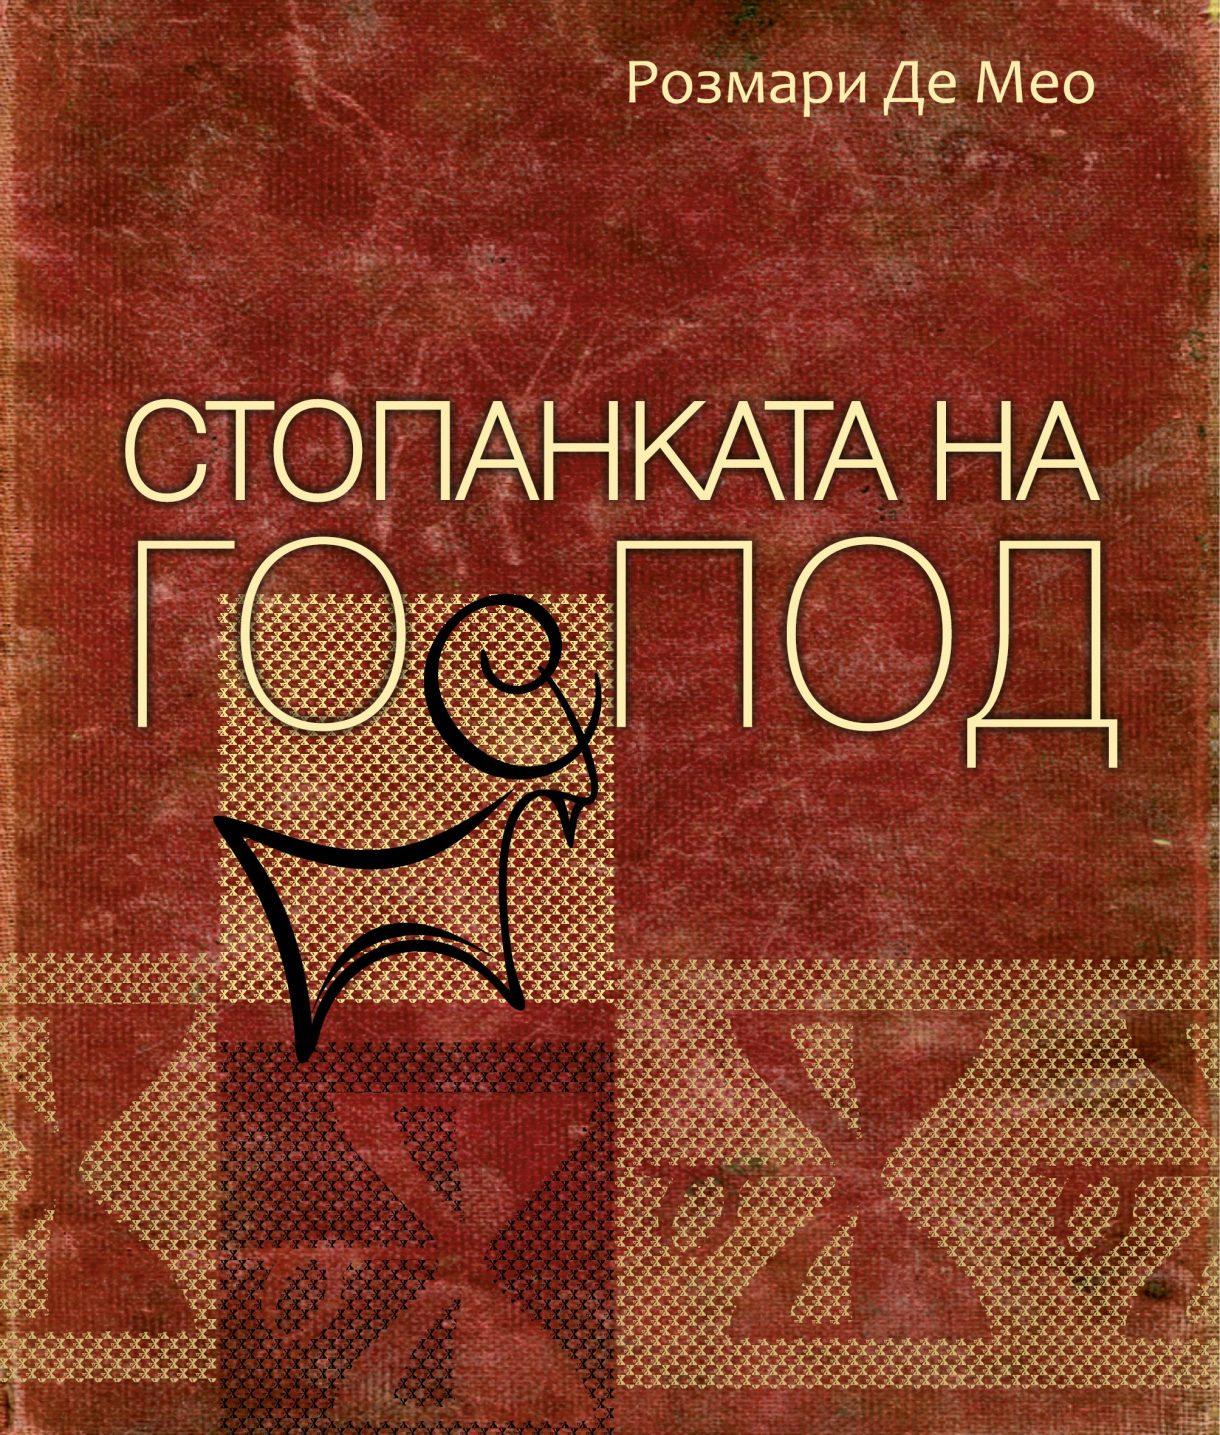 Российский автор книг фантастики